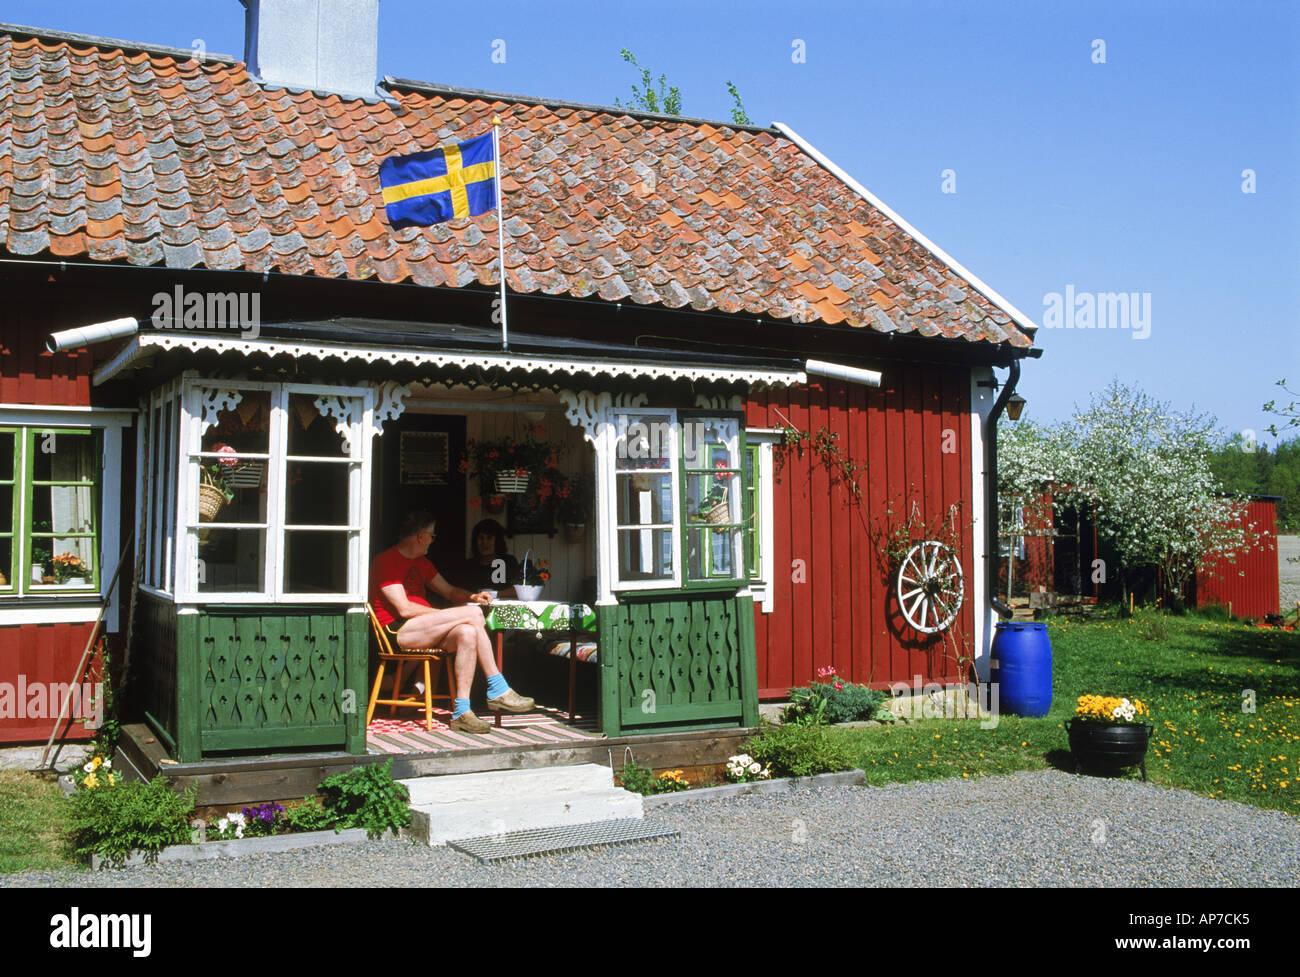 Red Swedish Farmhouse Design Html on swedish interior design, swedish loft design, swedish restaurant design, swedish office design, swedish garden design, swedish home design, swedish kitchen design, swedish design style, swedish apartment design, swedish modern design, swedish traditional design, swedish cottage design, swedish log cabin design, swedish barn design, swedish country design,